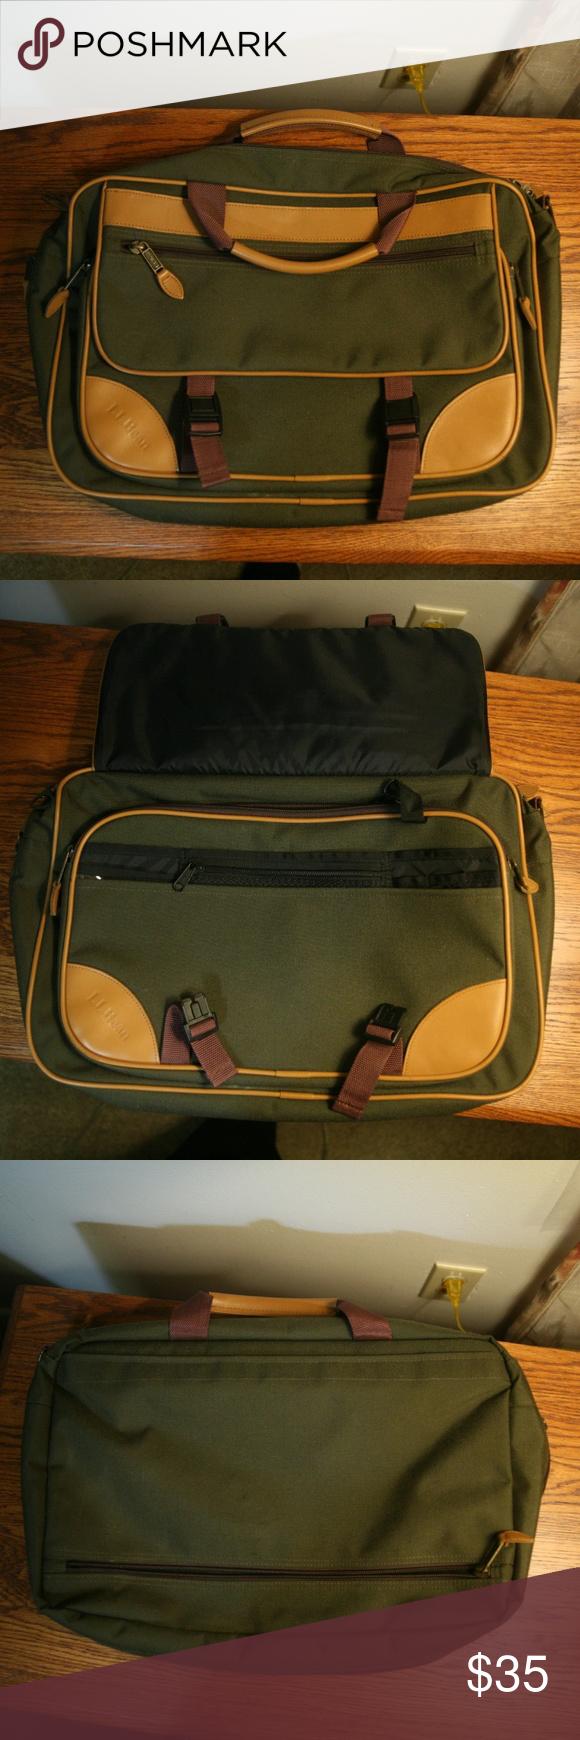 L L Bean Traveling Bag In 2020 Bags Man Bag Clothes Design